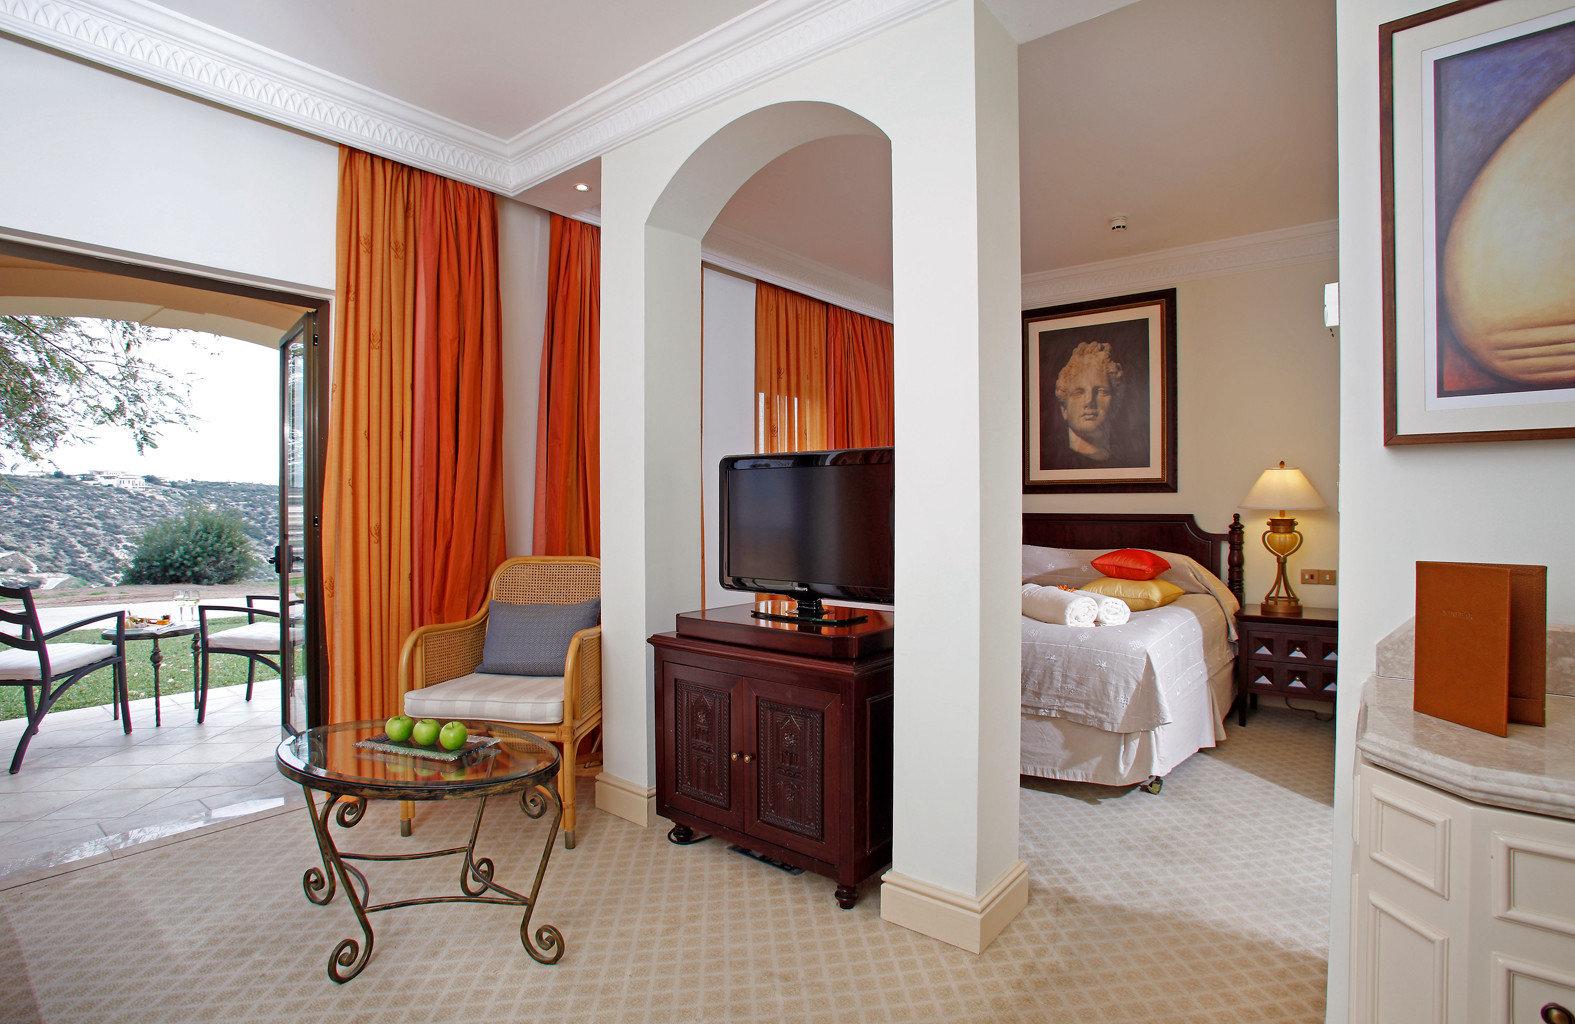 Balcony Bedroom Family Luxury Resort Suite Wellness property home cottage hardwood Villa living room